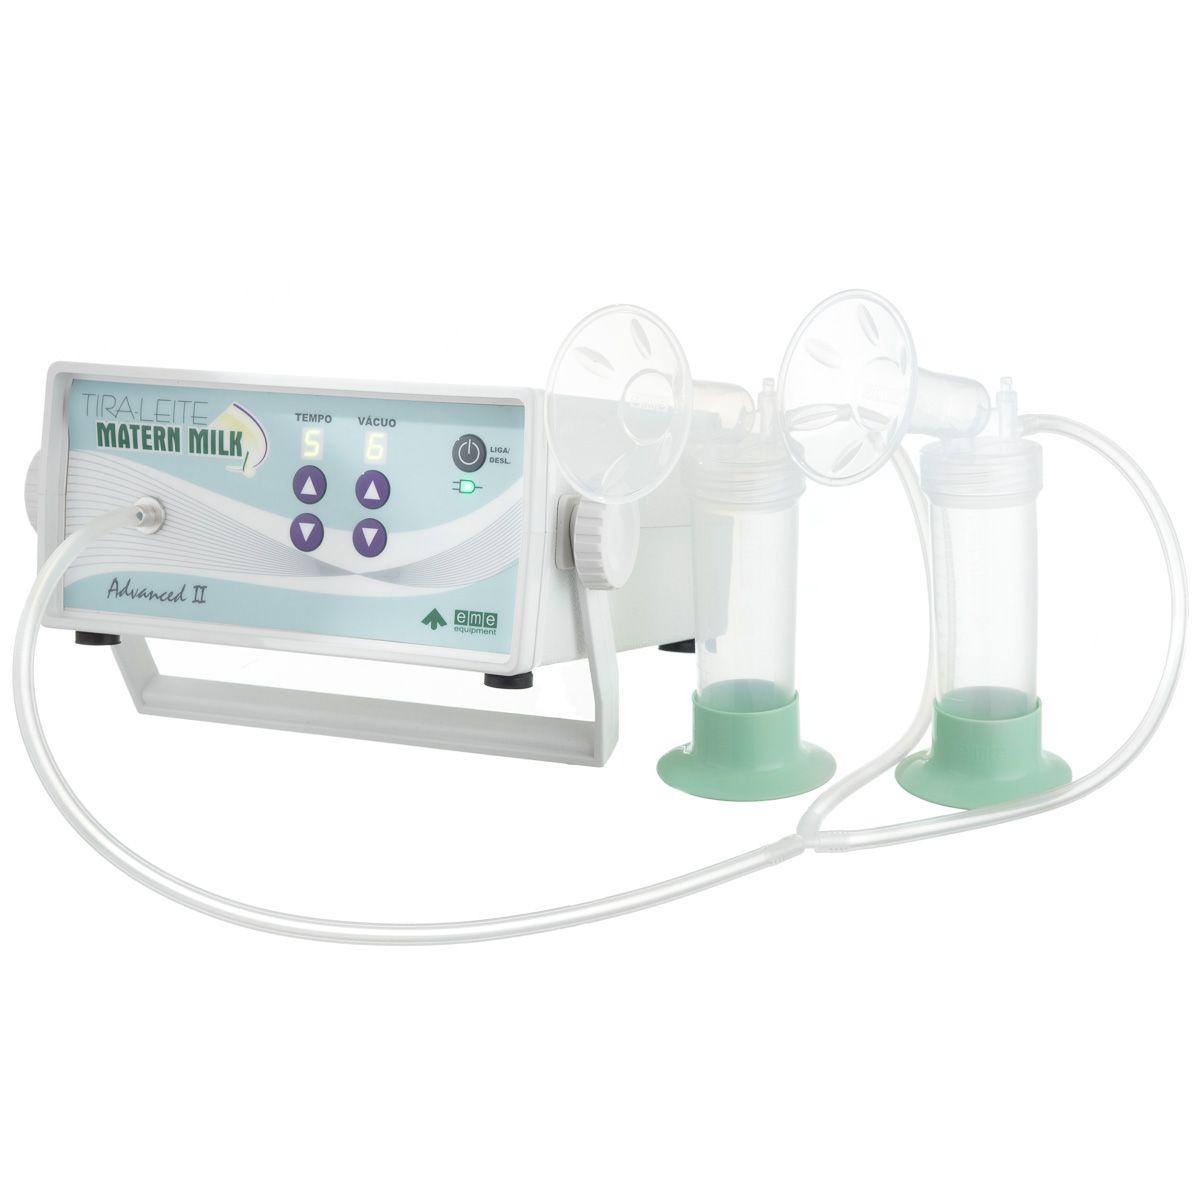 Bomba Tira Leite Hospitalar Matern Milk Advanced - Bivolt